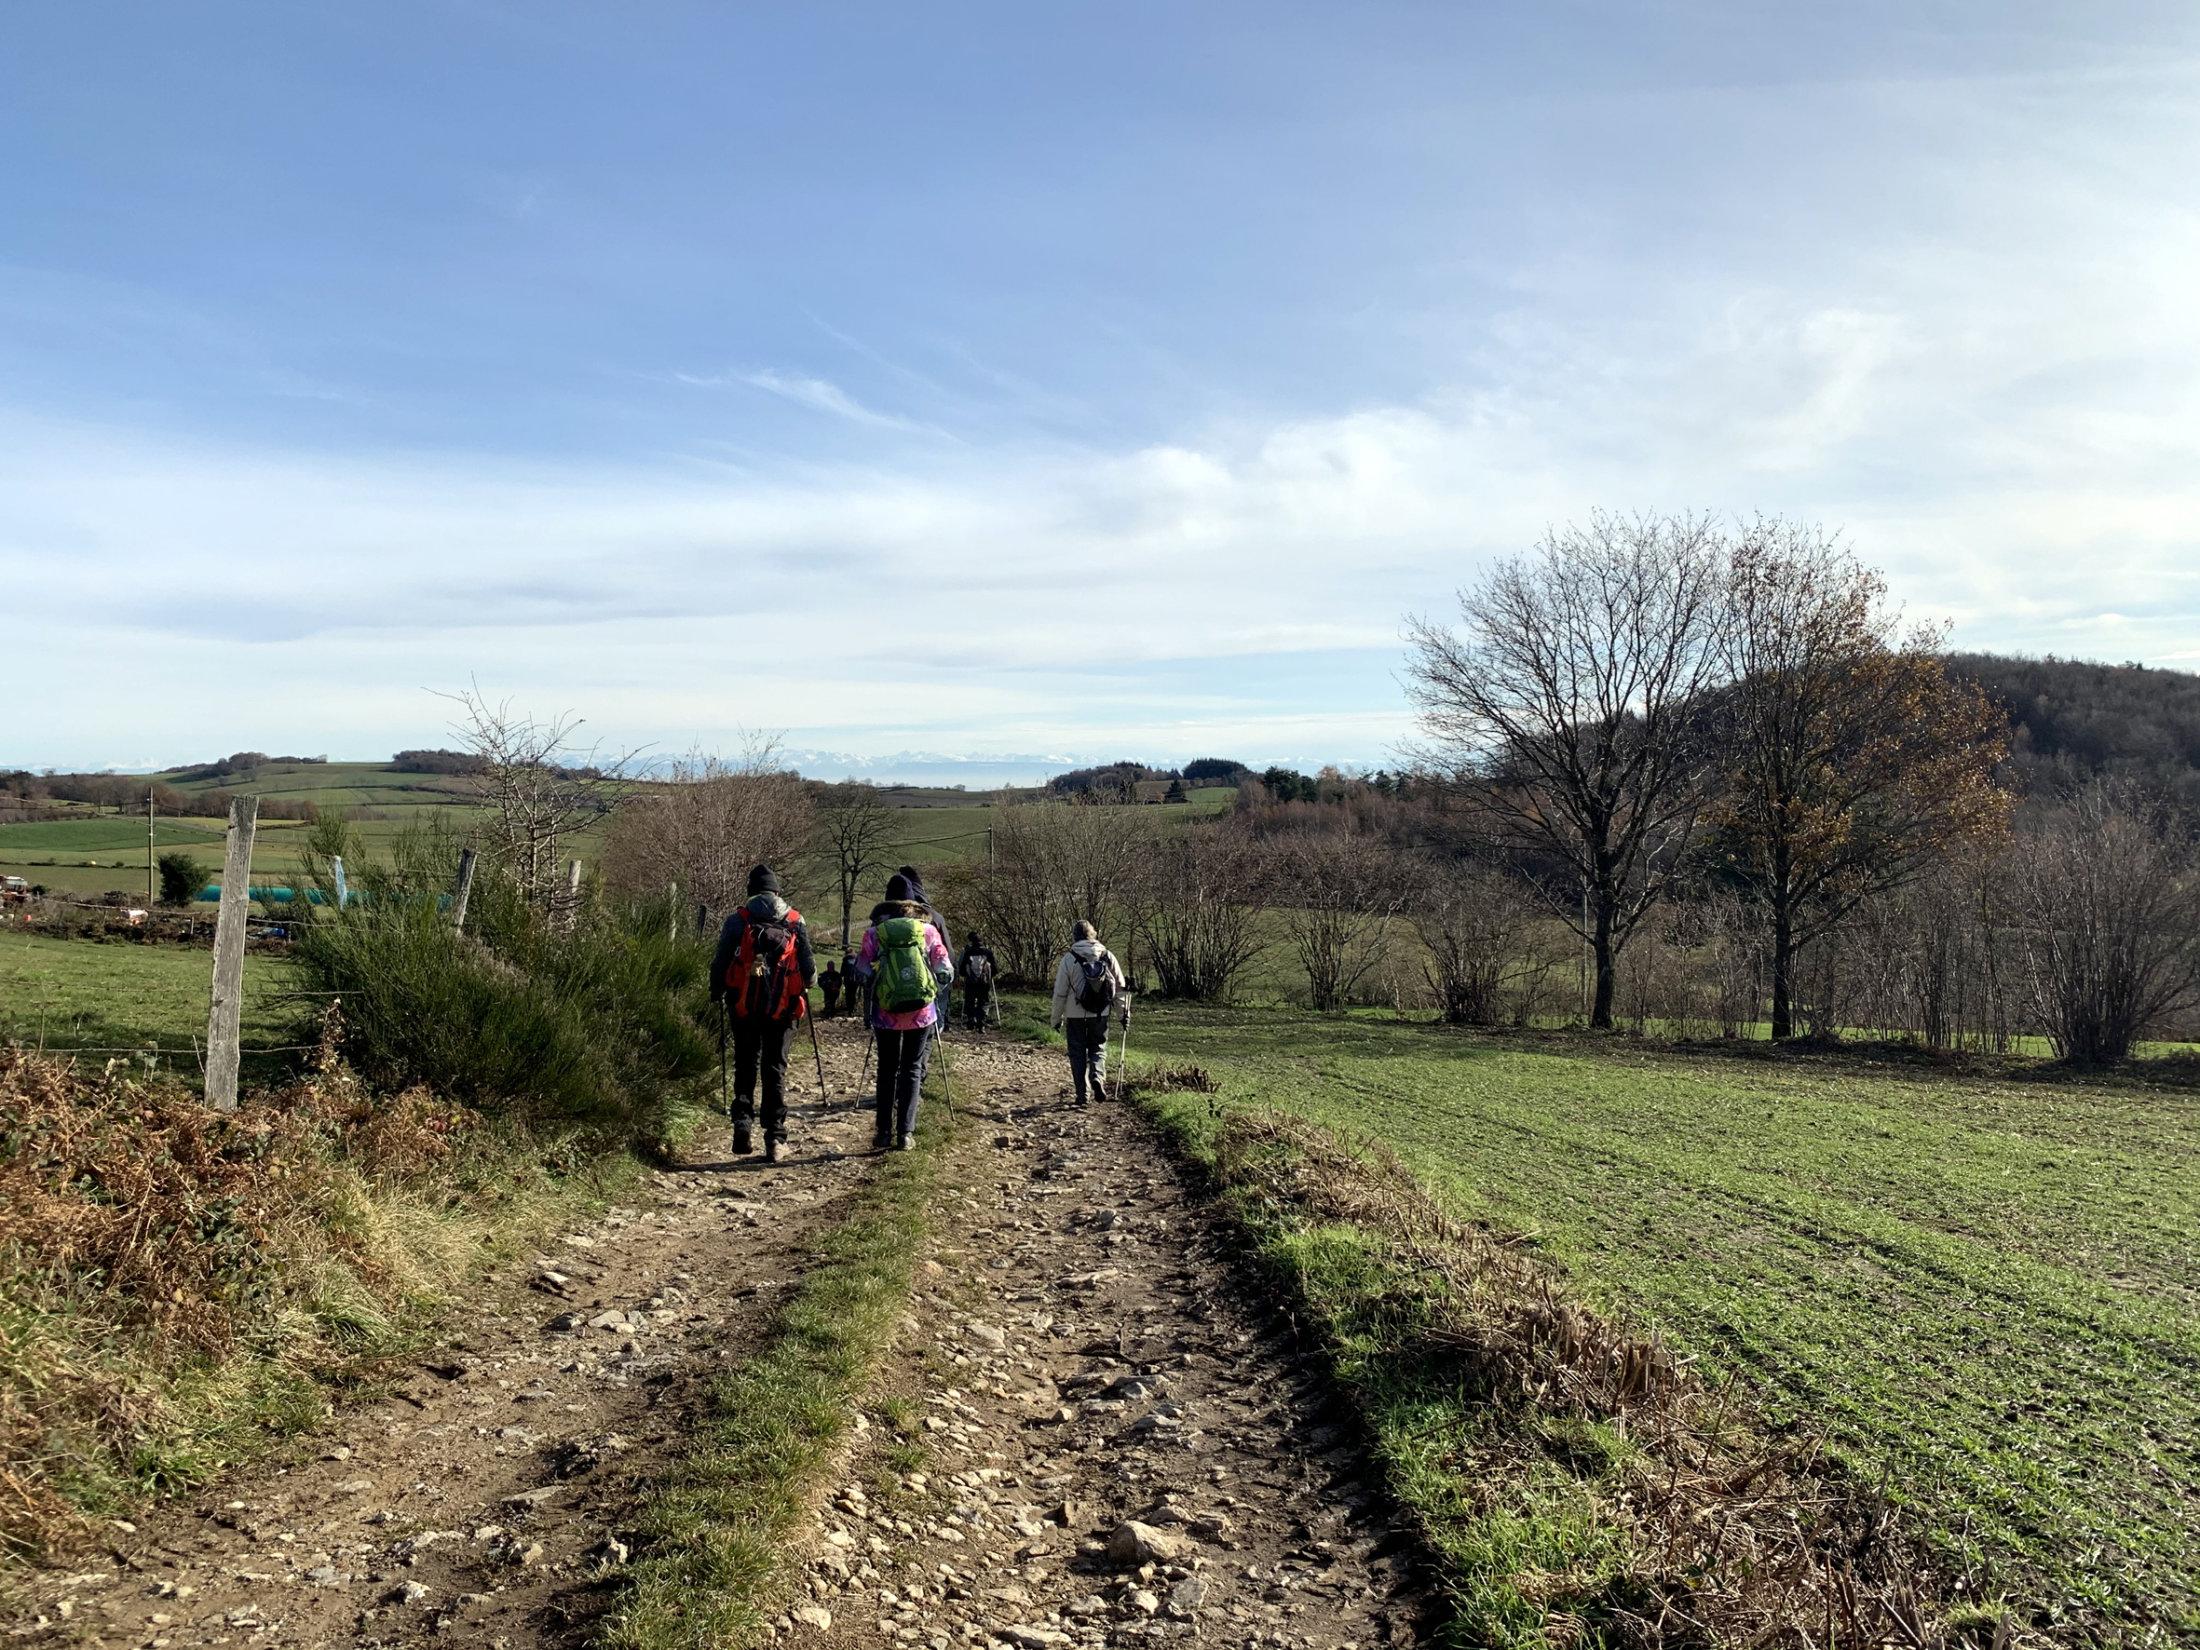 2019.12.05 St Christo-En-Jarez (2)